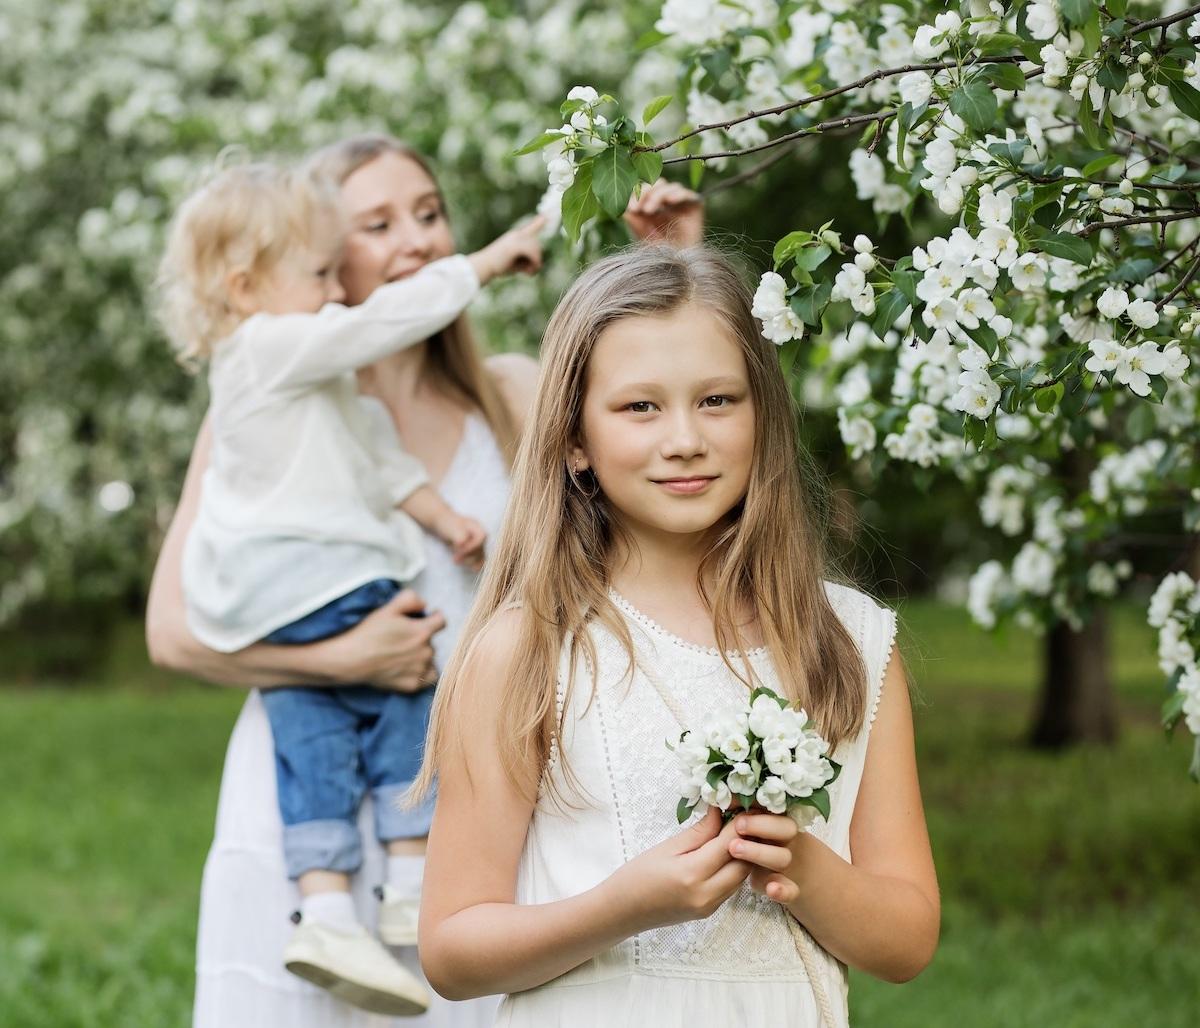 Holistic Healing with Flower Essences